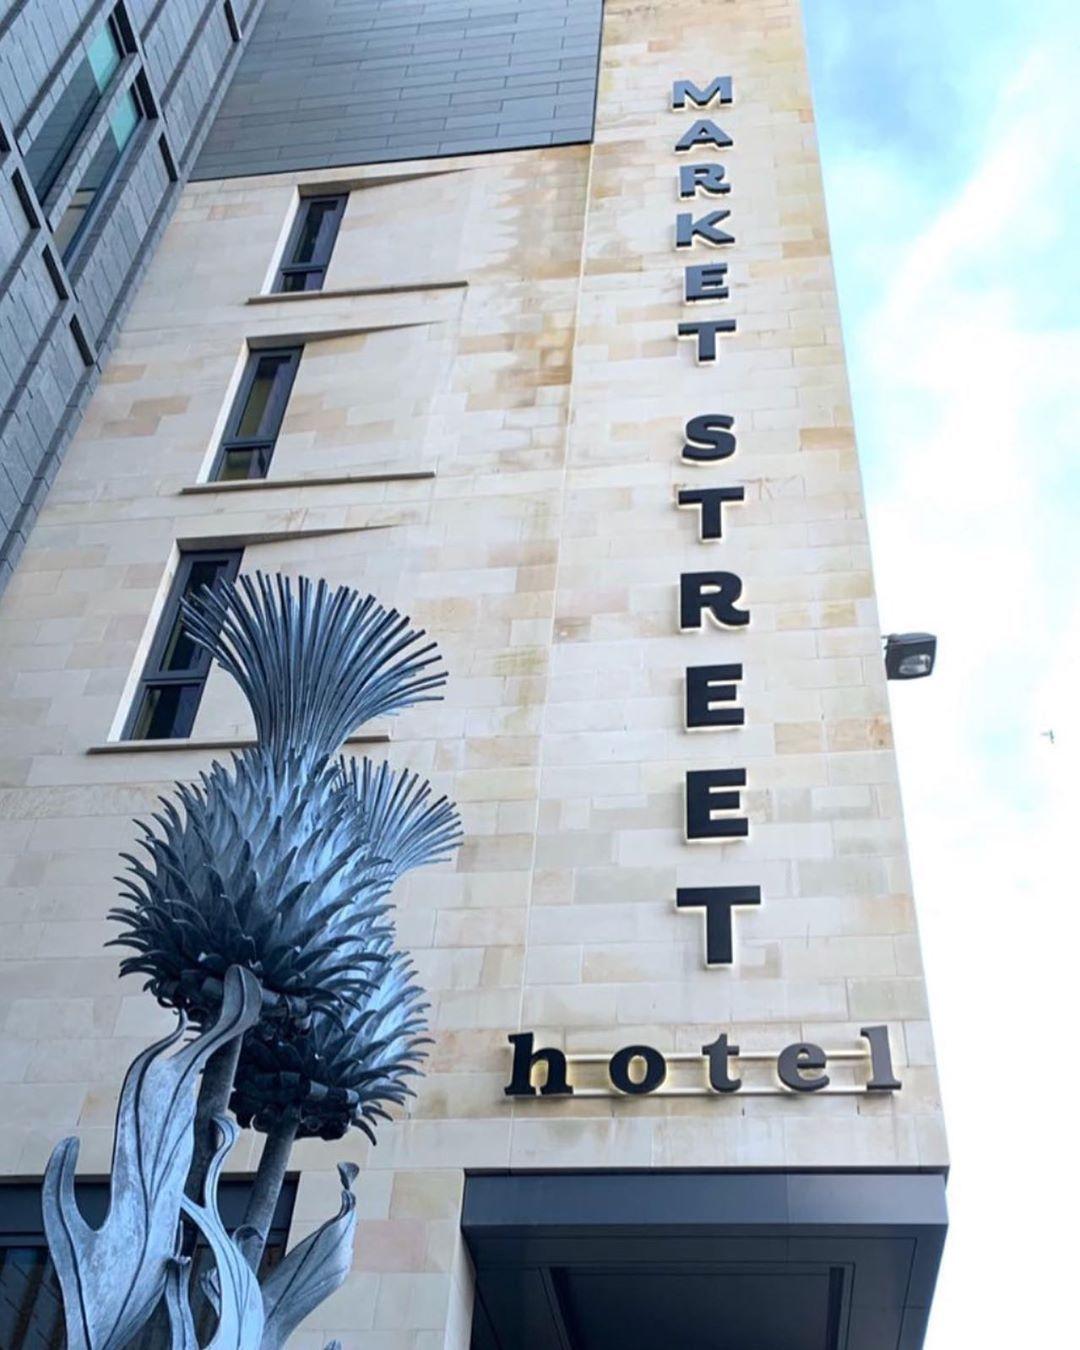 "Market Street hotel on Instagram: ""Patiently waiting to see you again ❤️. #visitedinburgh #visitscotland #visitbritain #designhotel #staycation #thisisedinburgh"""